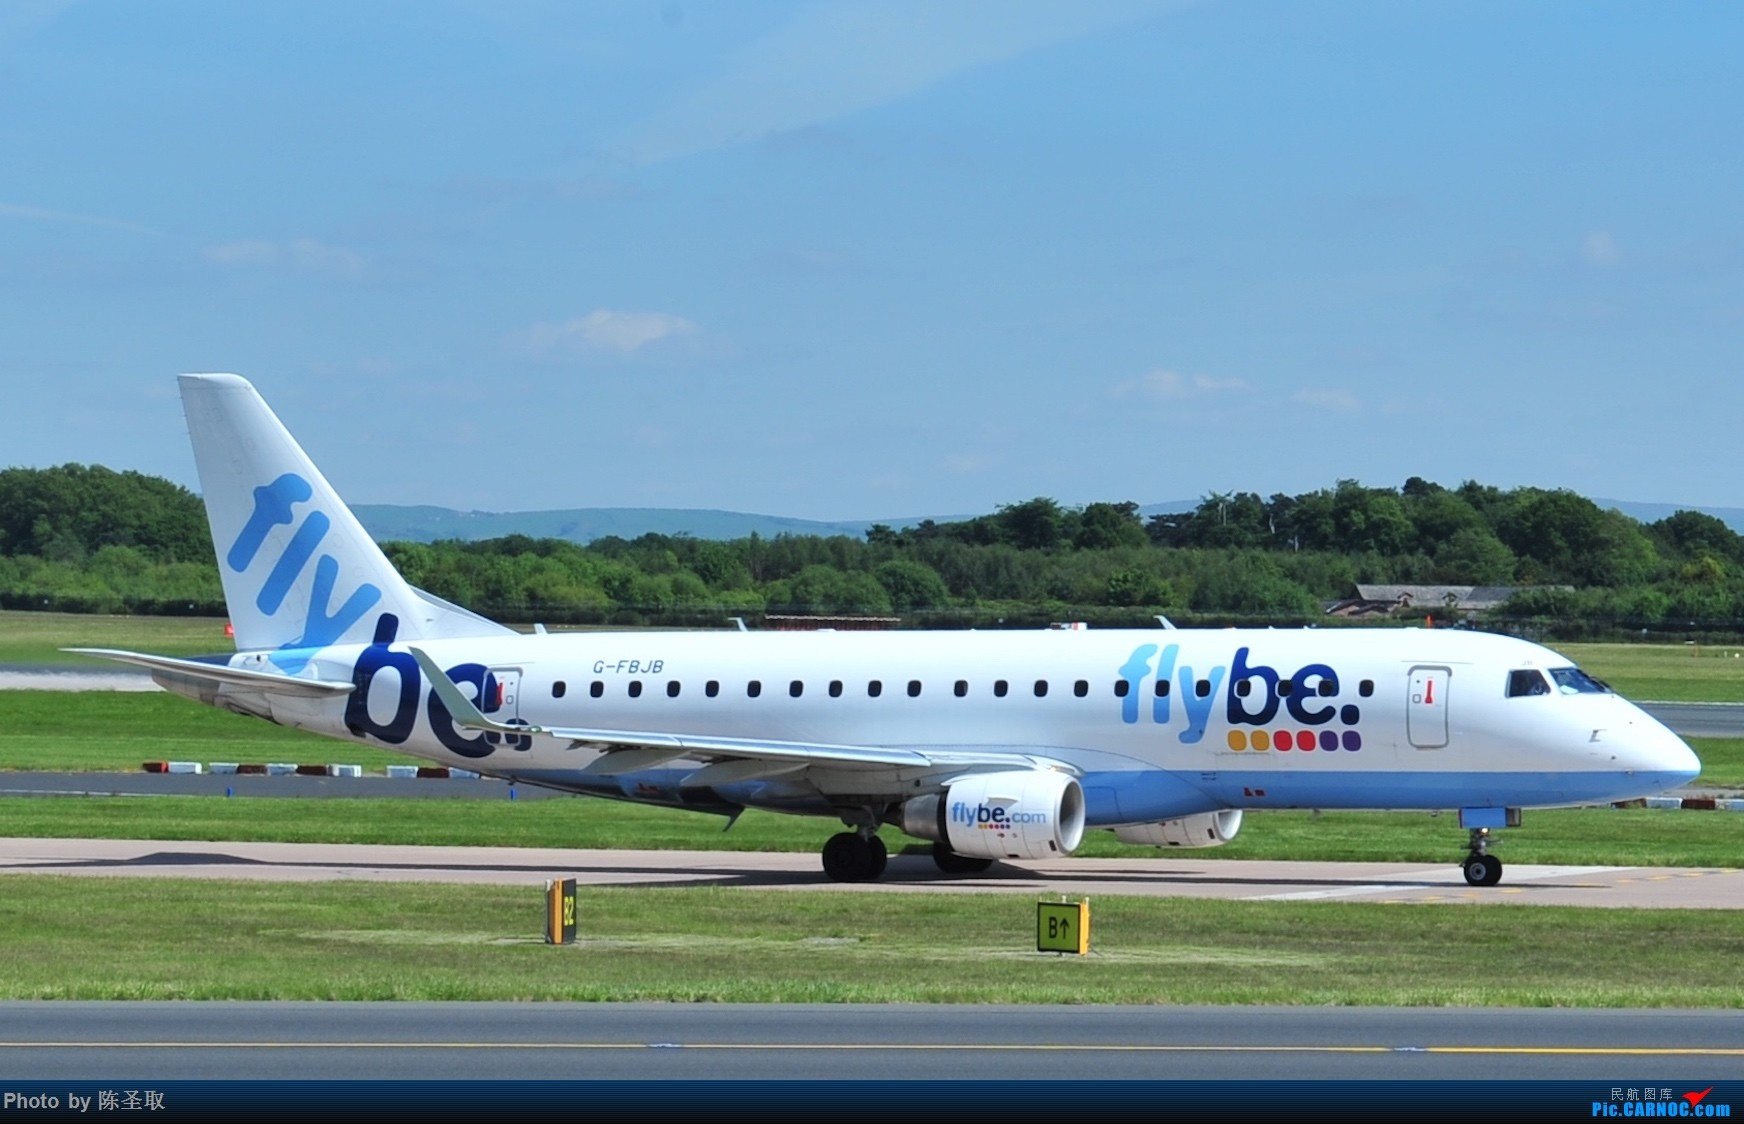 Re:[原创]迟来的6月曼城拍机图。廉价航空的天堂,曼彻斯特机场~ EMBRAER E-175STD G-FBJB 英国曼彻斯特机场